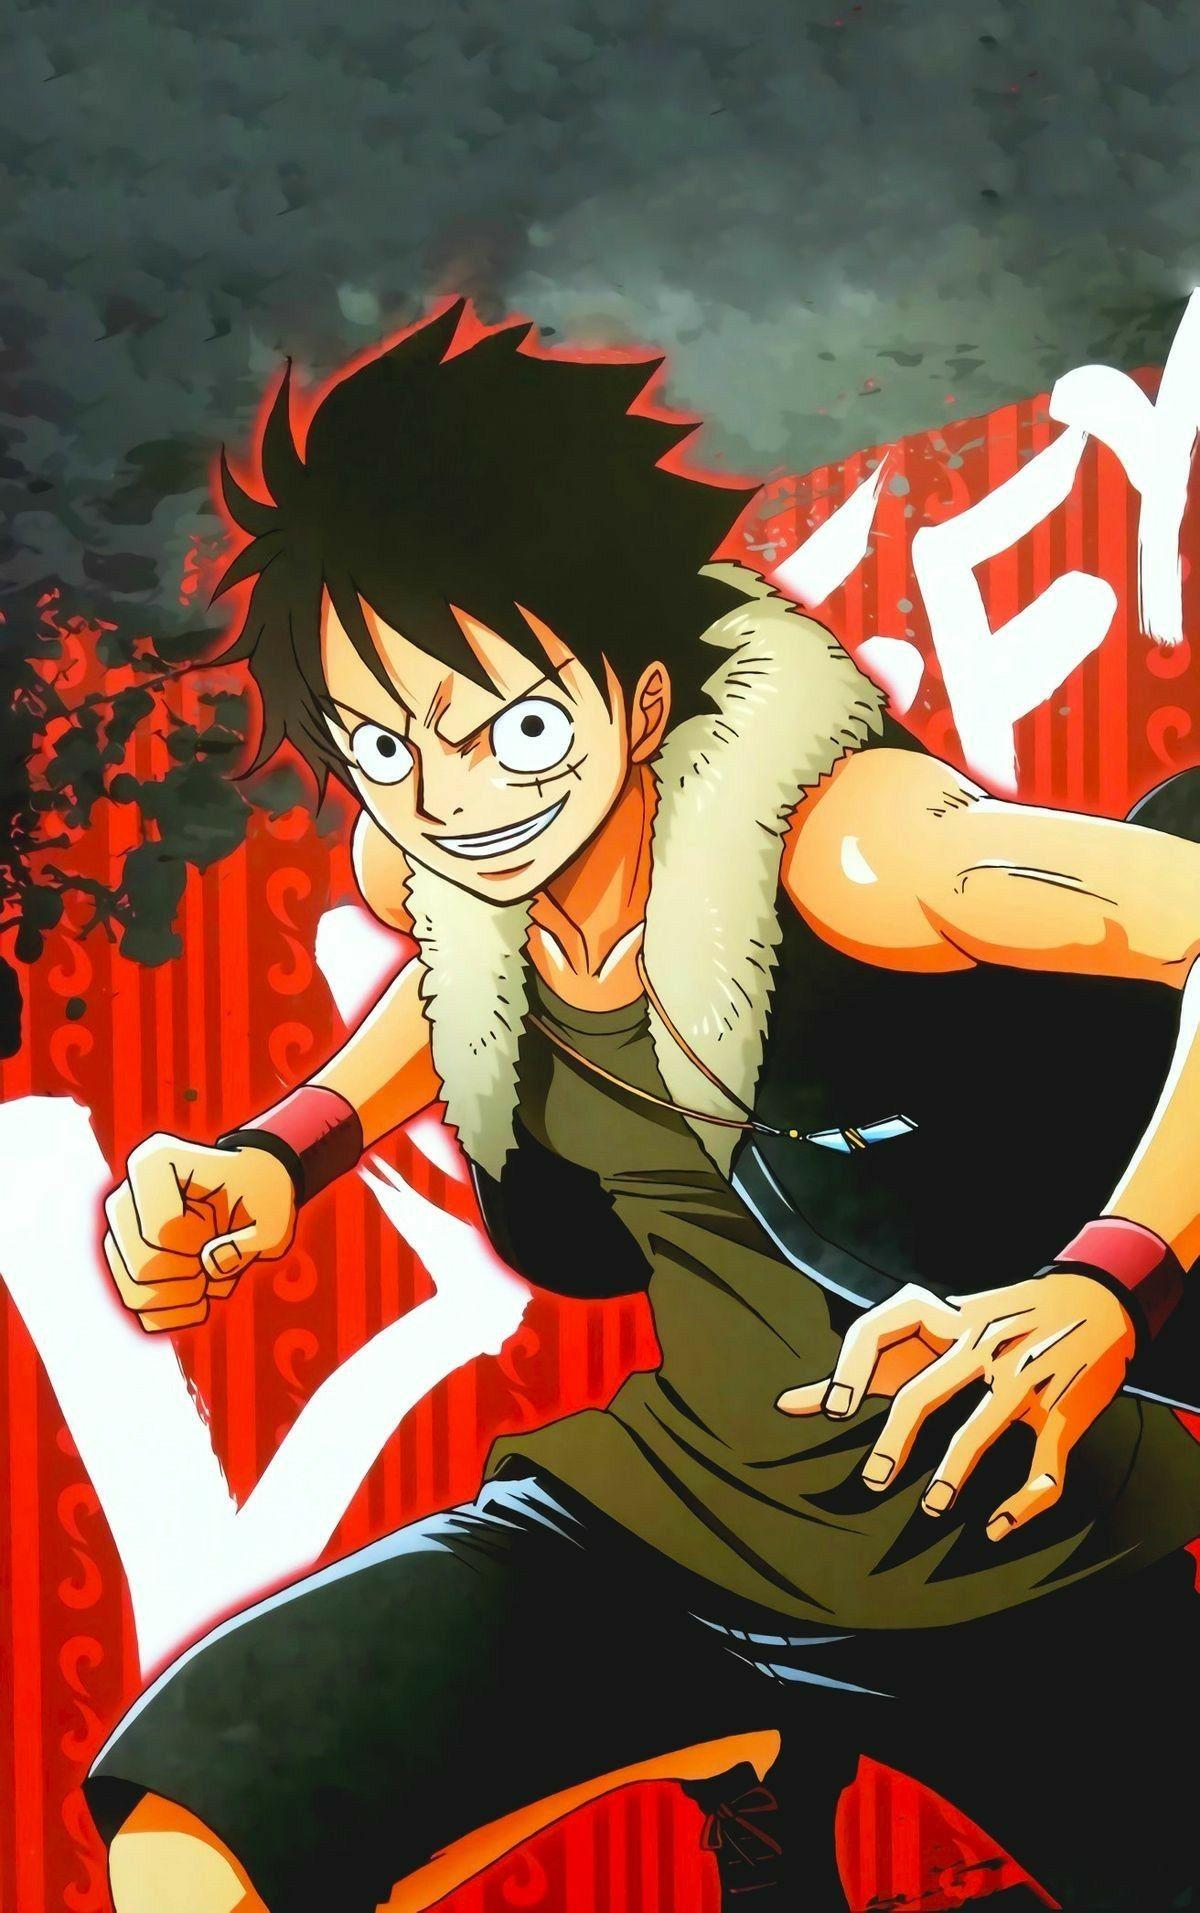 Anime wallpaper for vivo y53